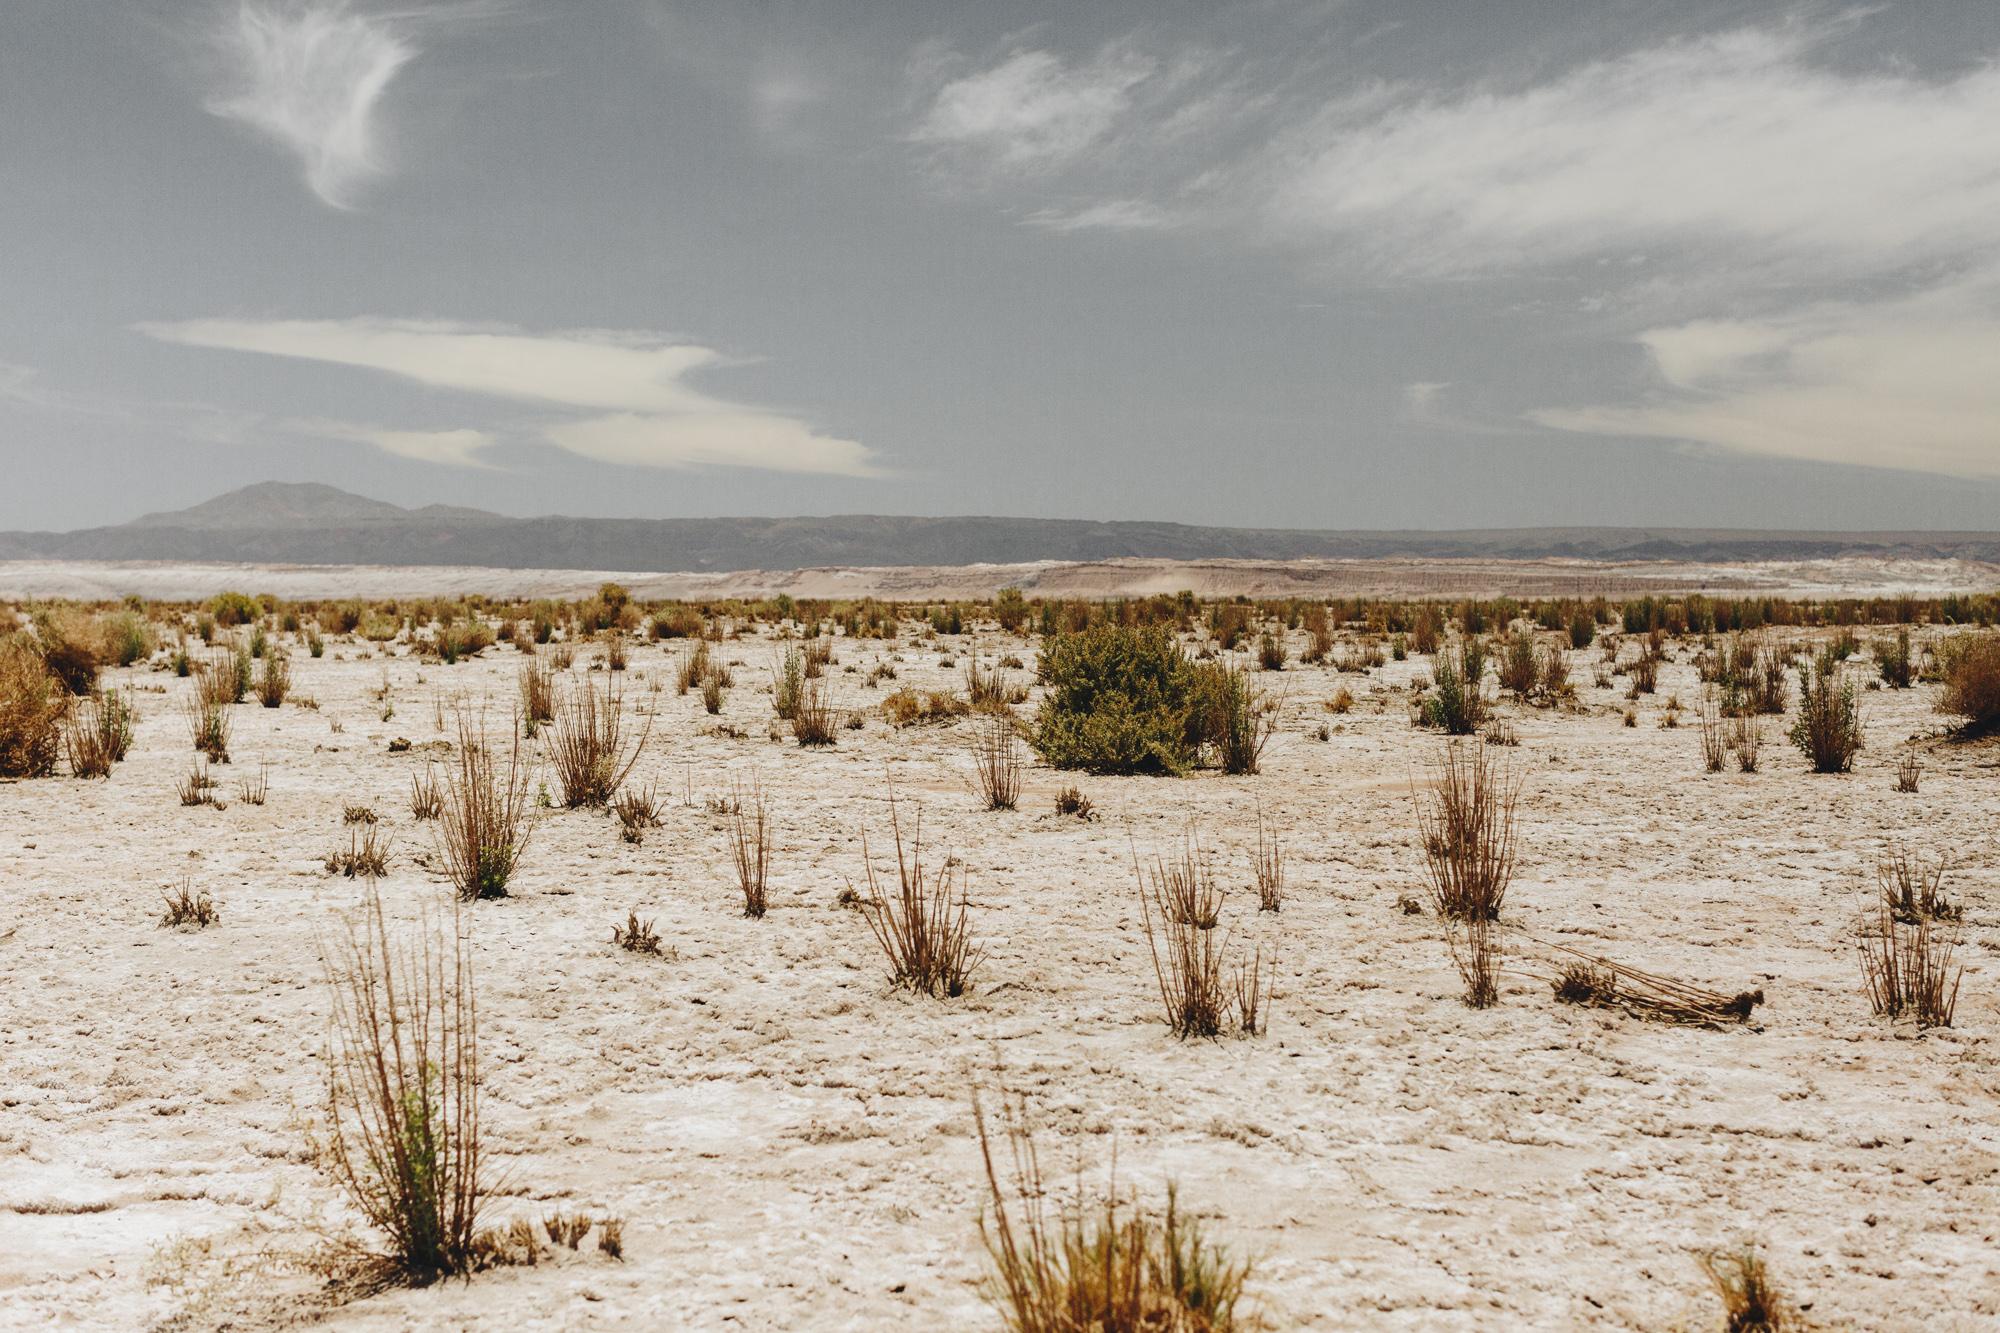 Mael Lambla photographer Chile San pedro atacama desert-68.jpg